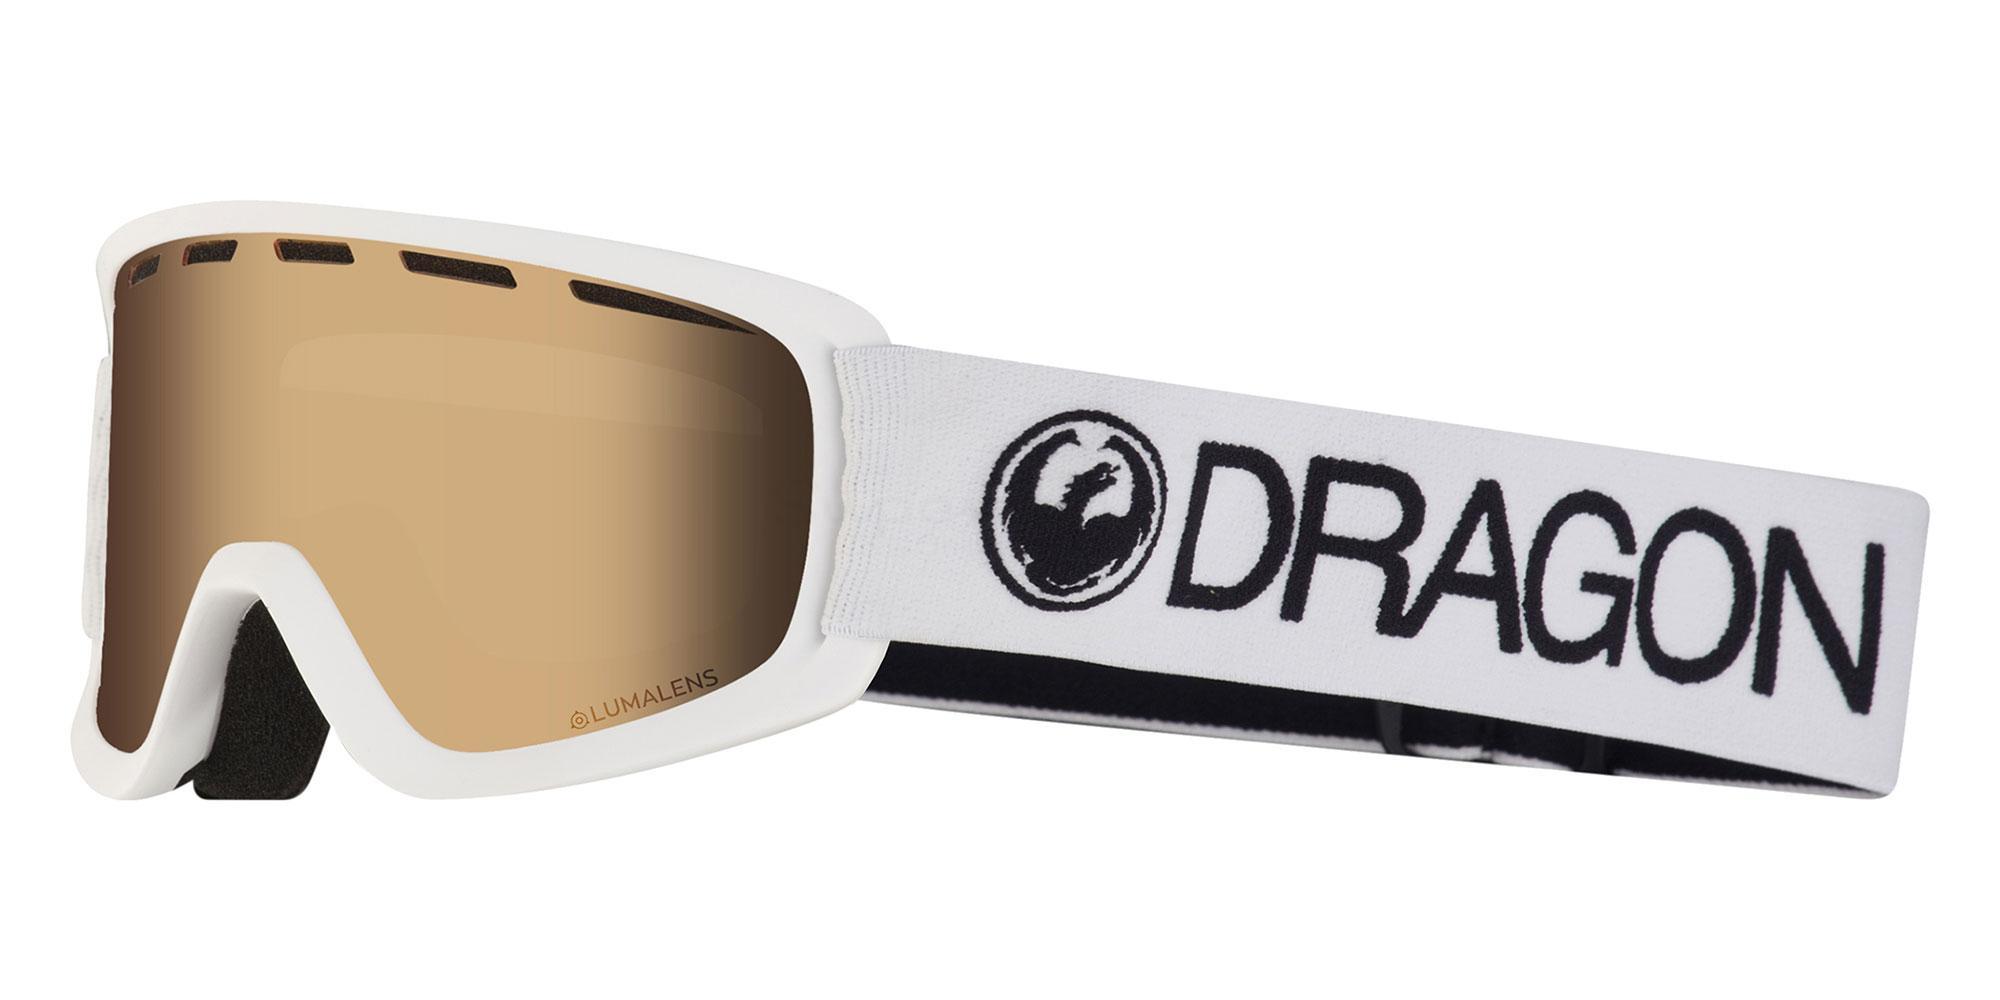 198 DR LIL D 6 Goggles, Dragon